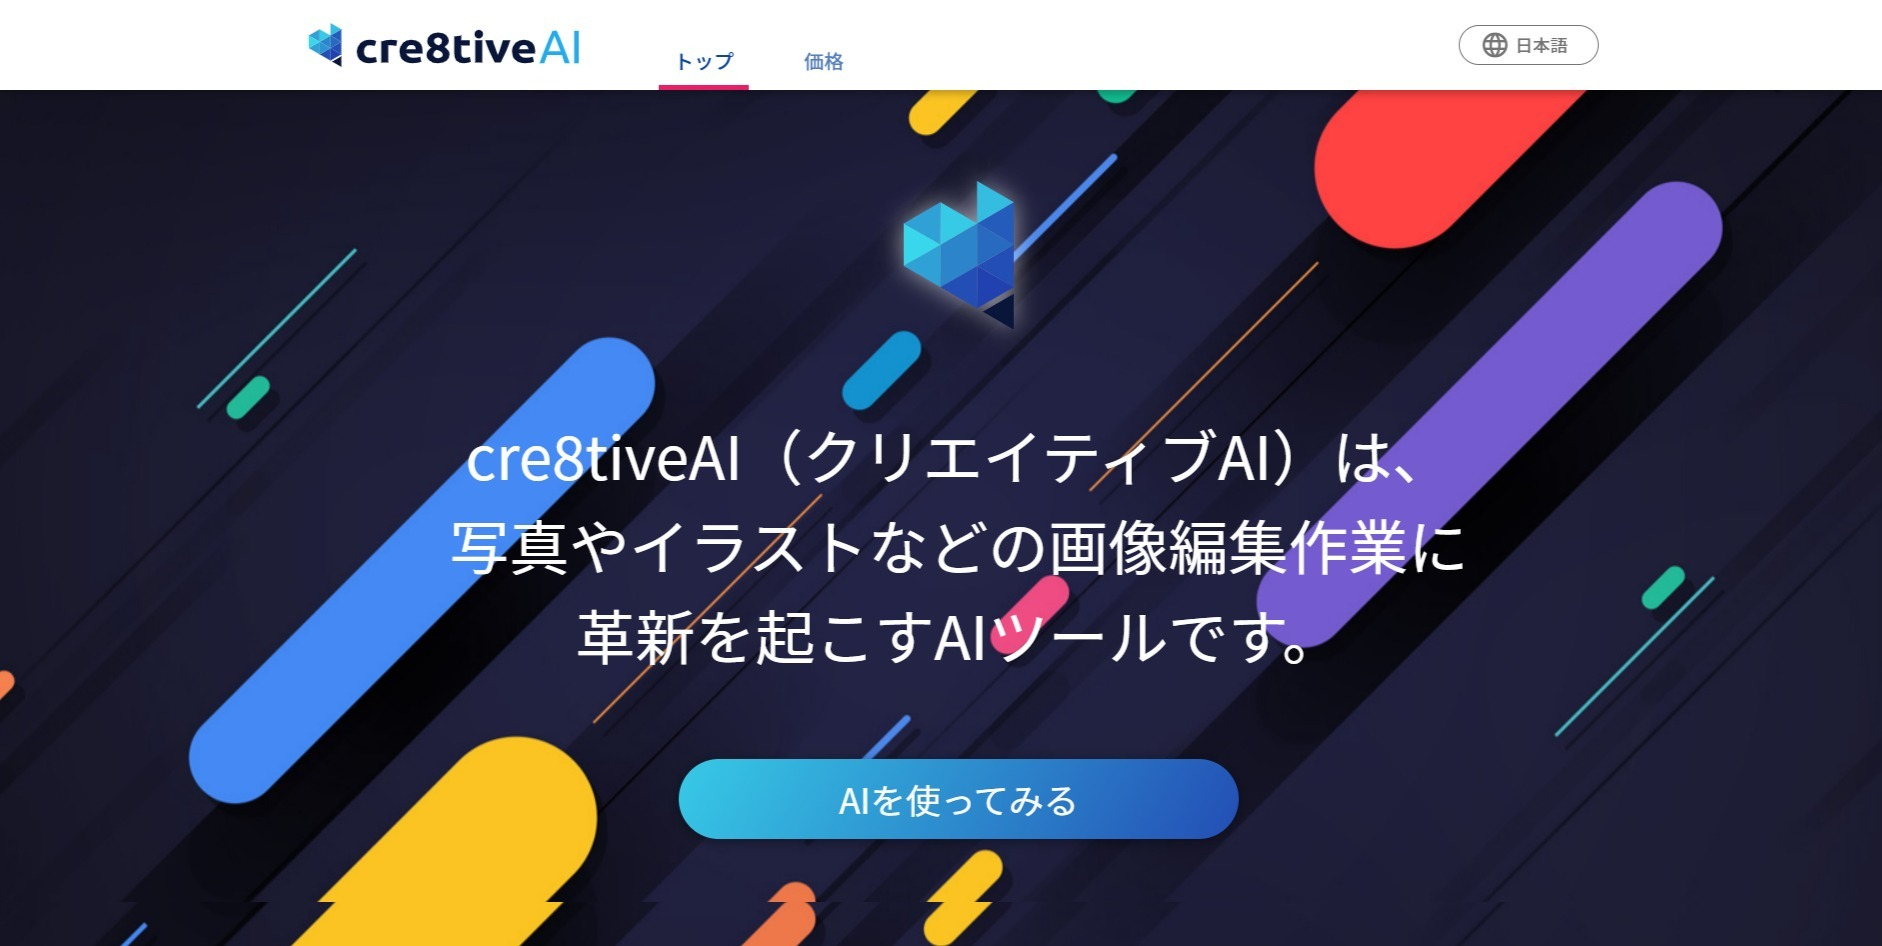 ・cre8tiveAI